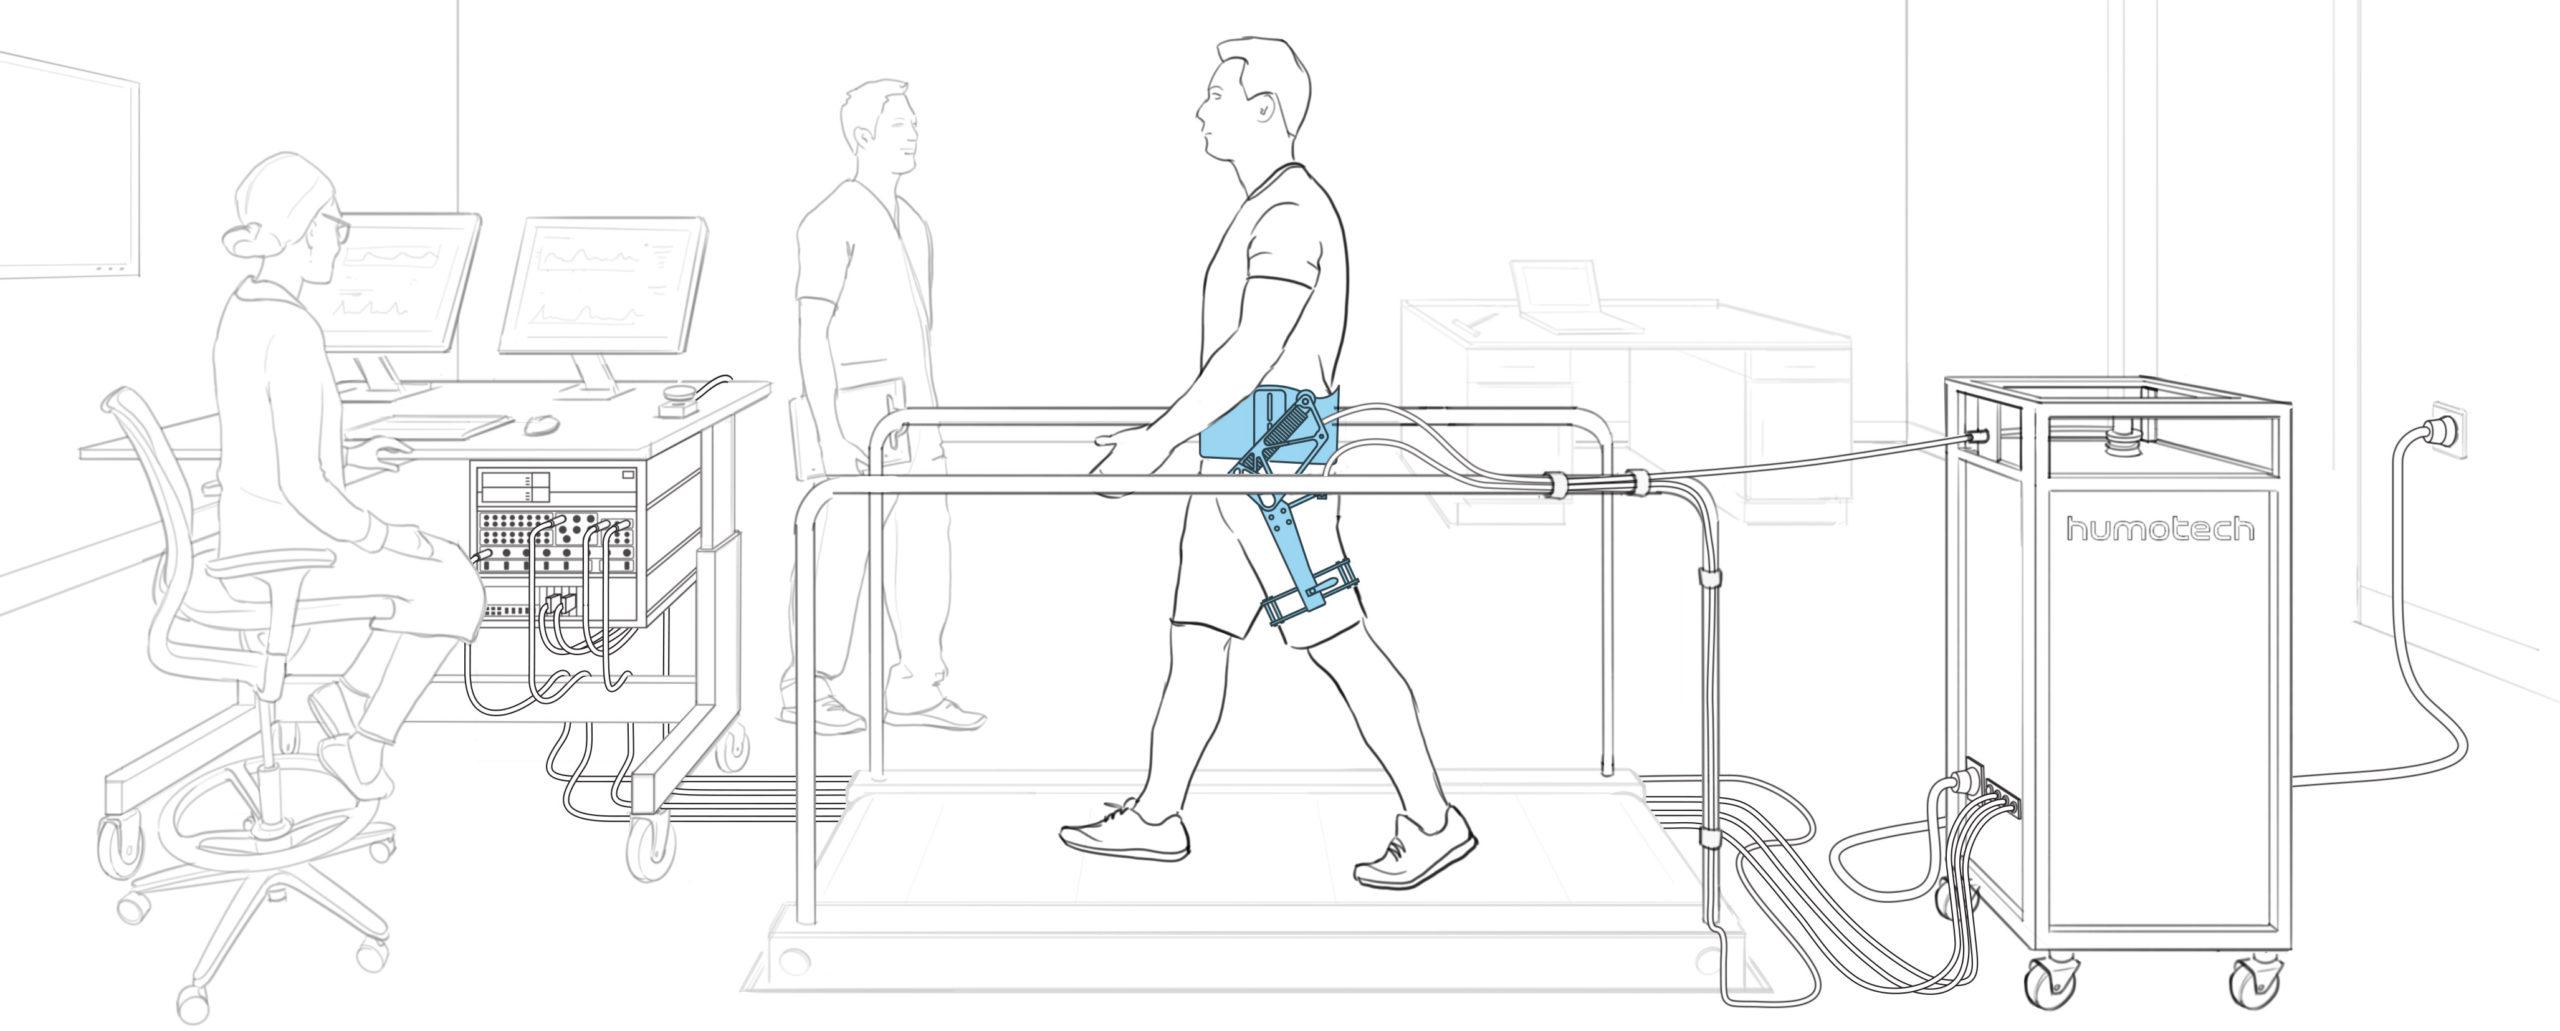 Full-Size Caplex System with EXO-004 Hip Exoskeleton